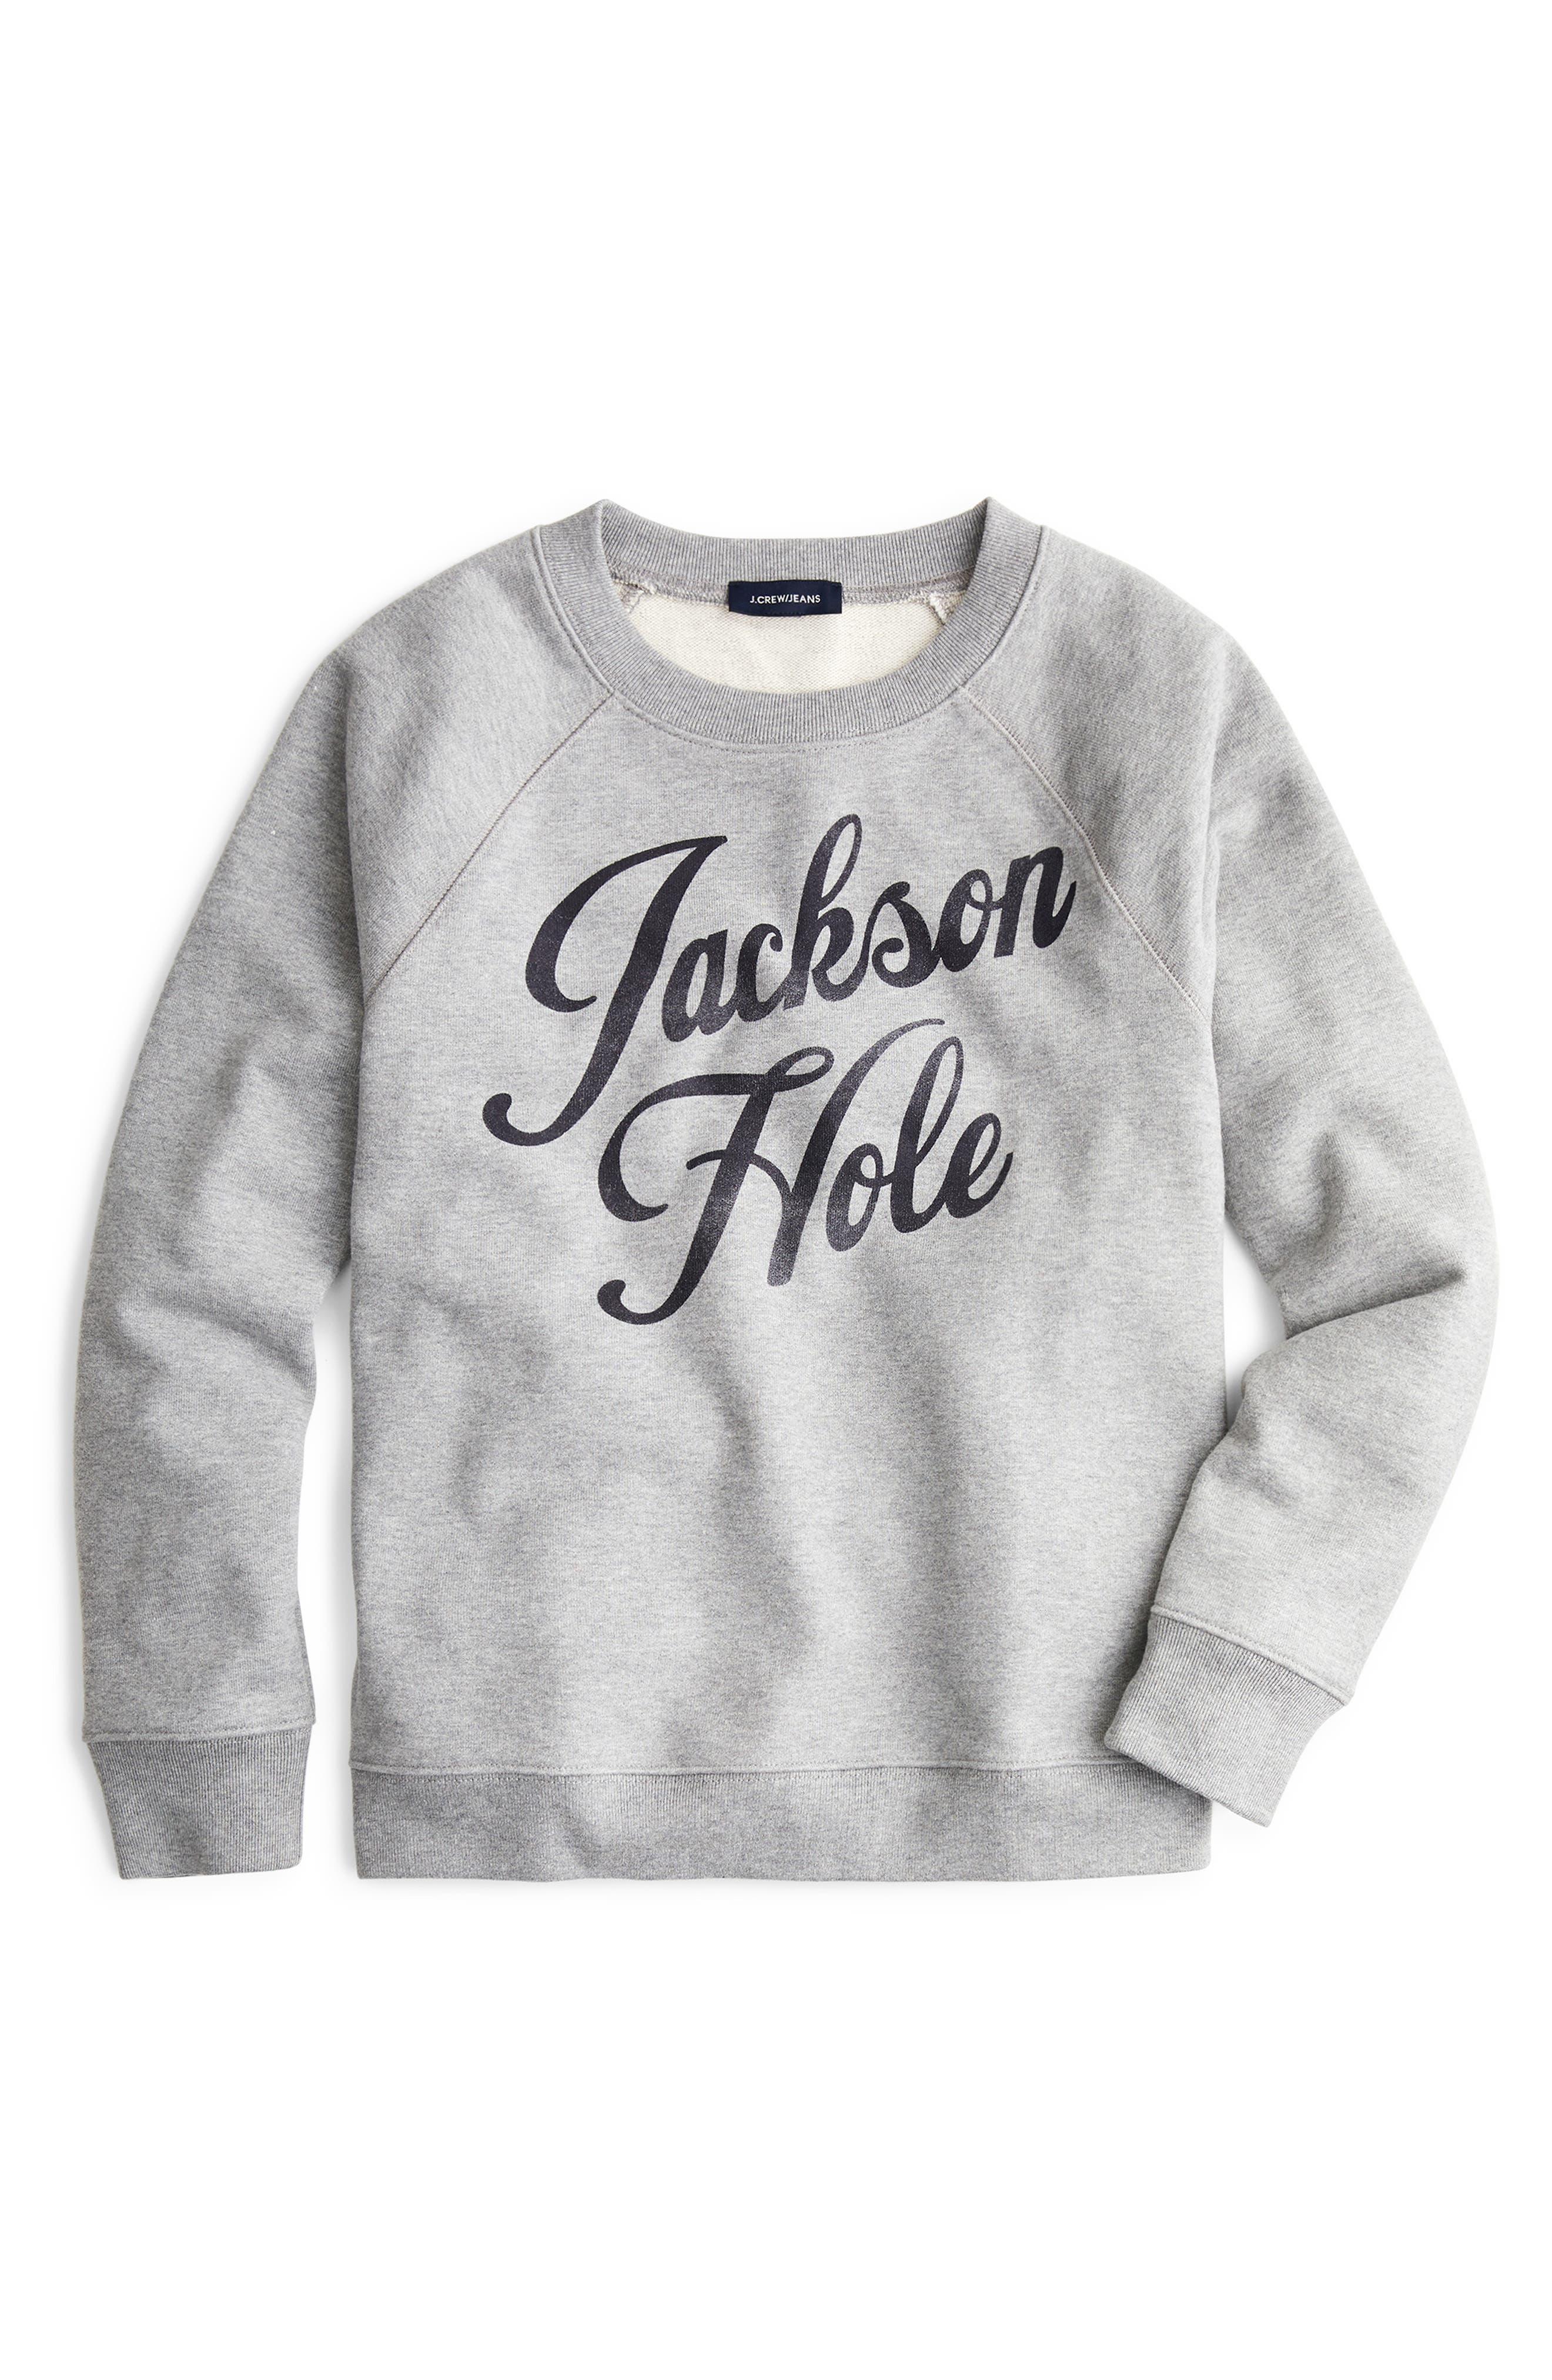 Jackson Hole Sweatshirt,                             Main thumbnail 1, color,                             HTHR. SILVER